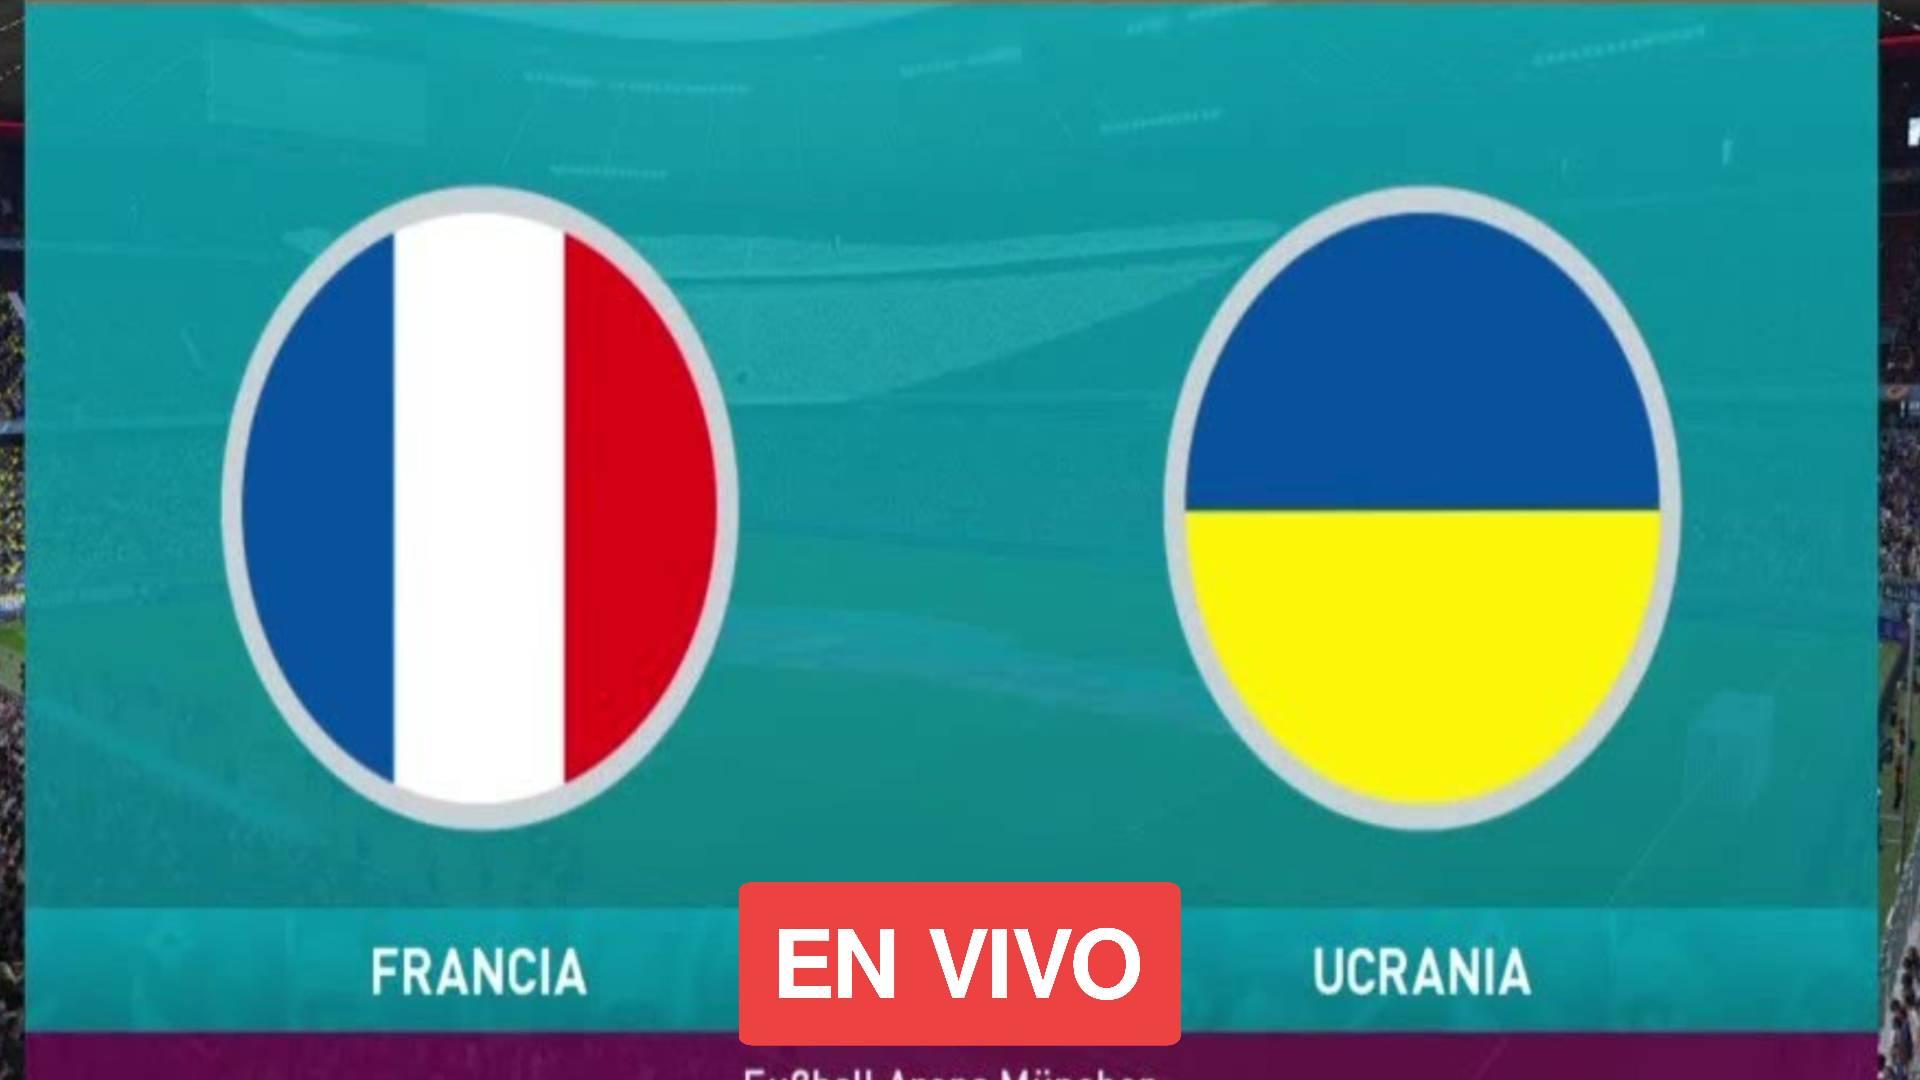 Ucrania vs Francia en vivo online